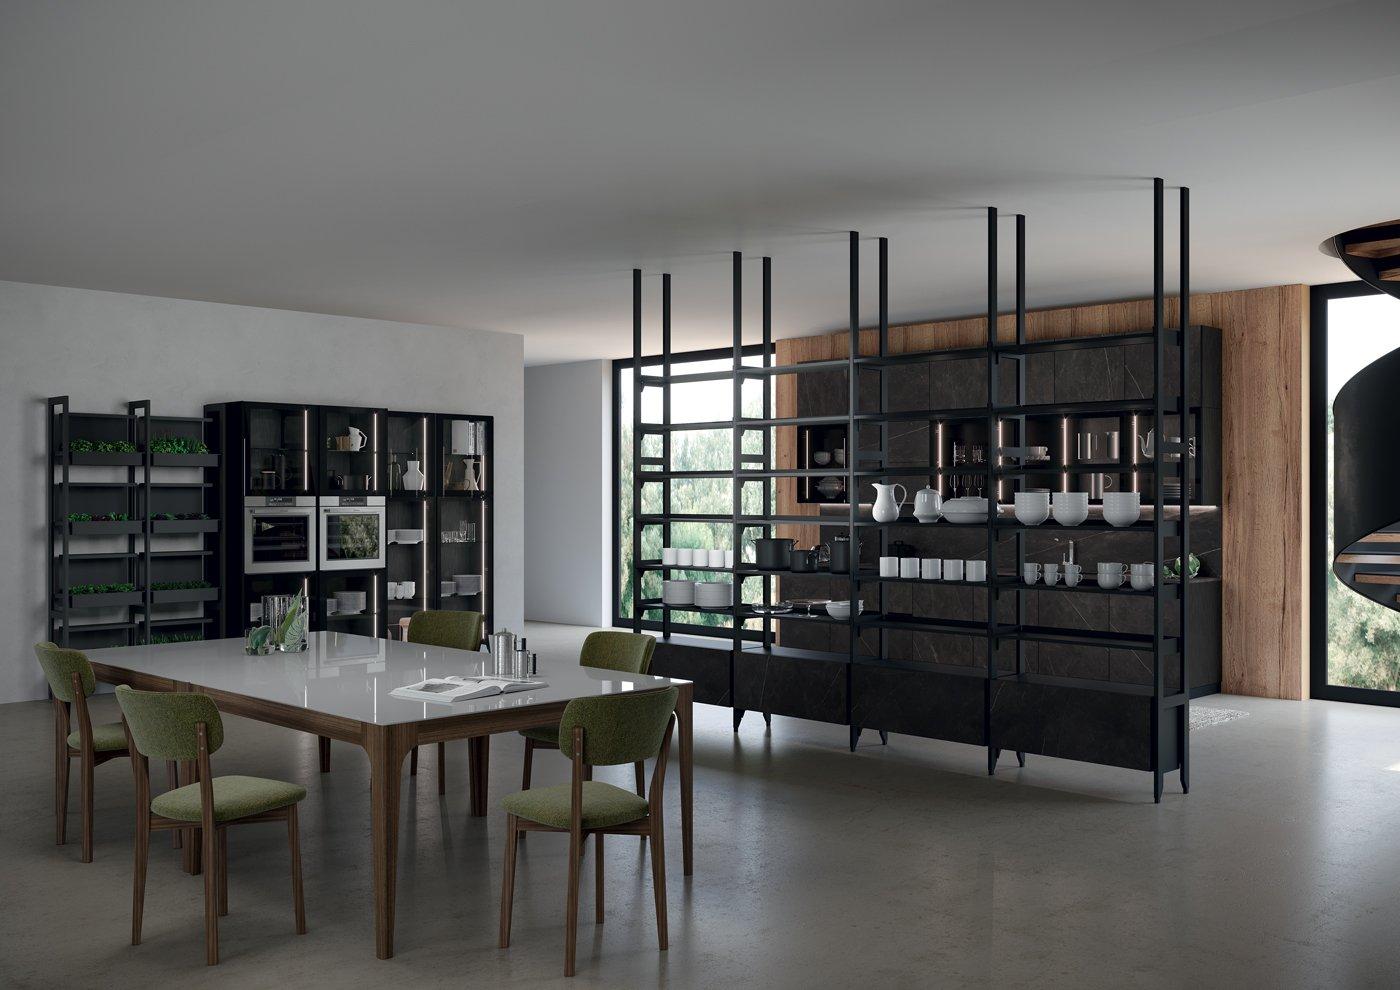 Febal-Casa-cucina-moderna-Kaleidos-open-space-stile-industriale-050-051jpg-mobilinoè